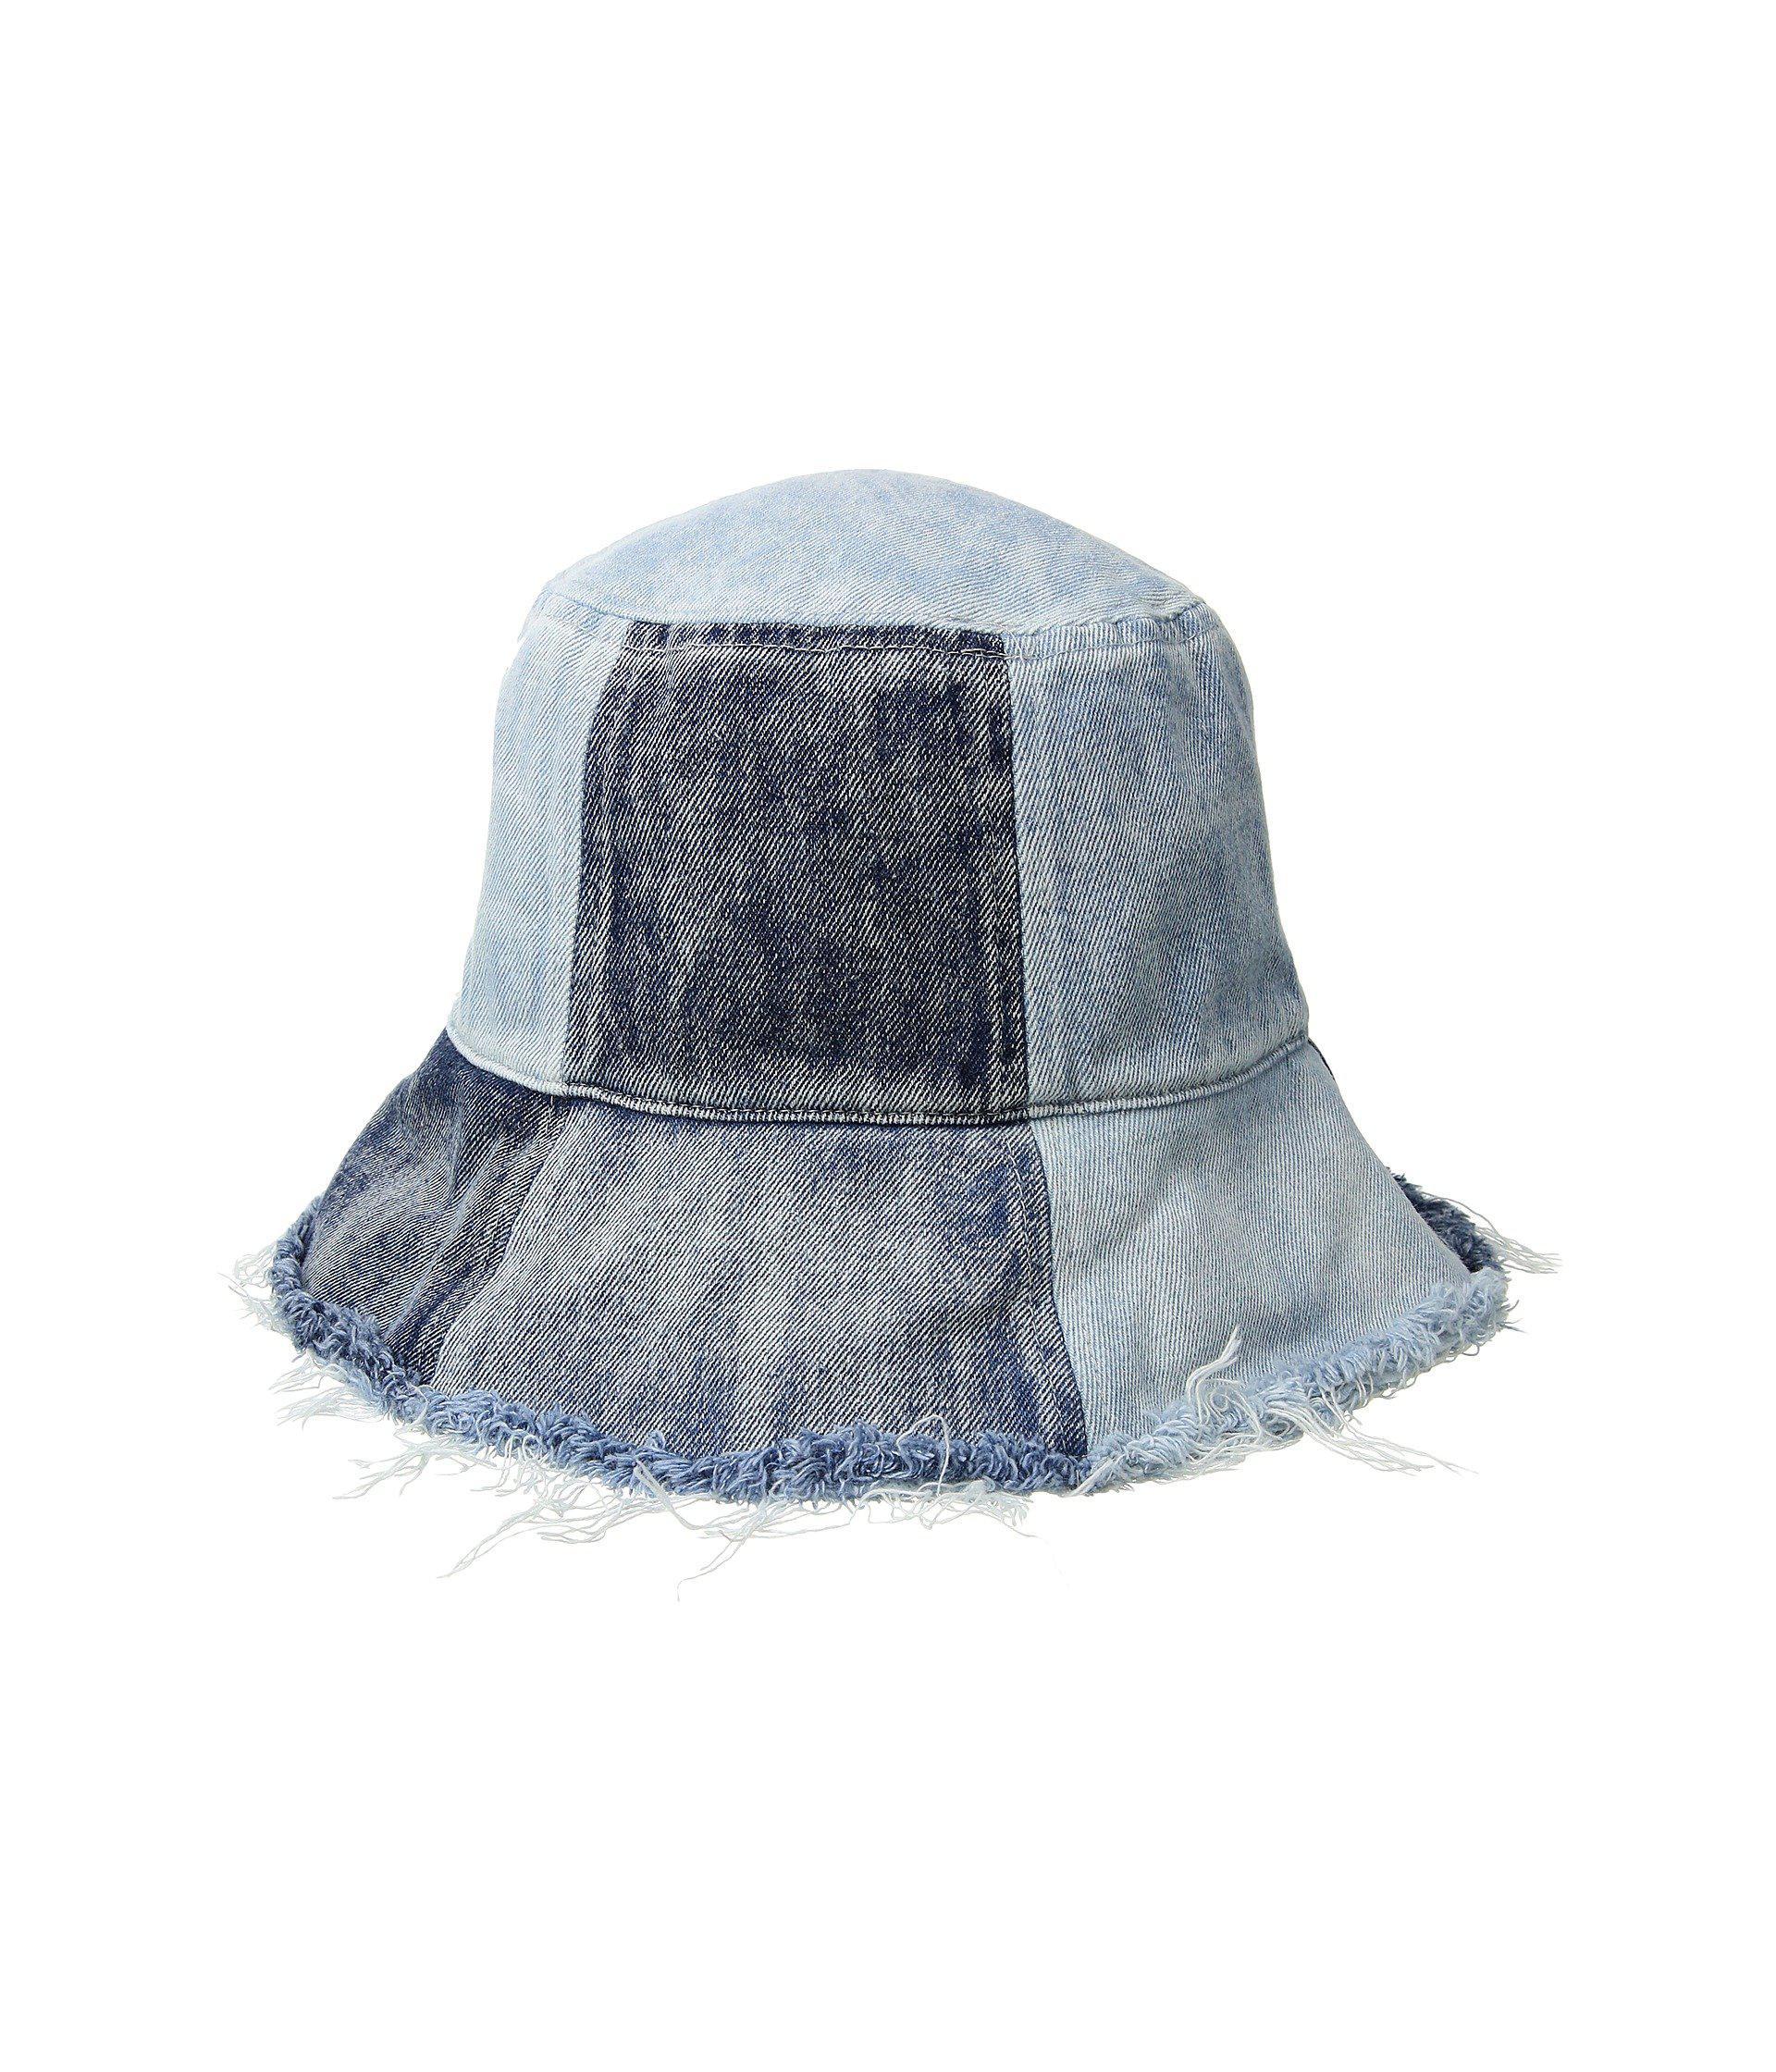 d15e9efe676 Lyst - BCBGeneration Patched Denim Bucket (denim) Caps in Blue